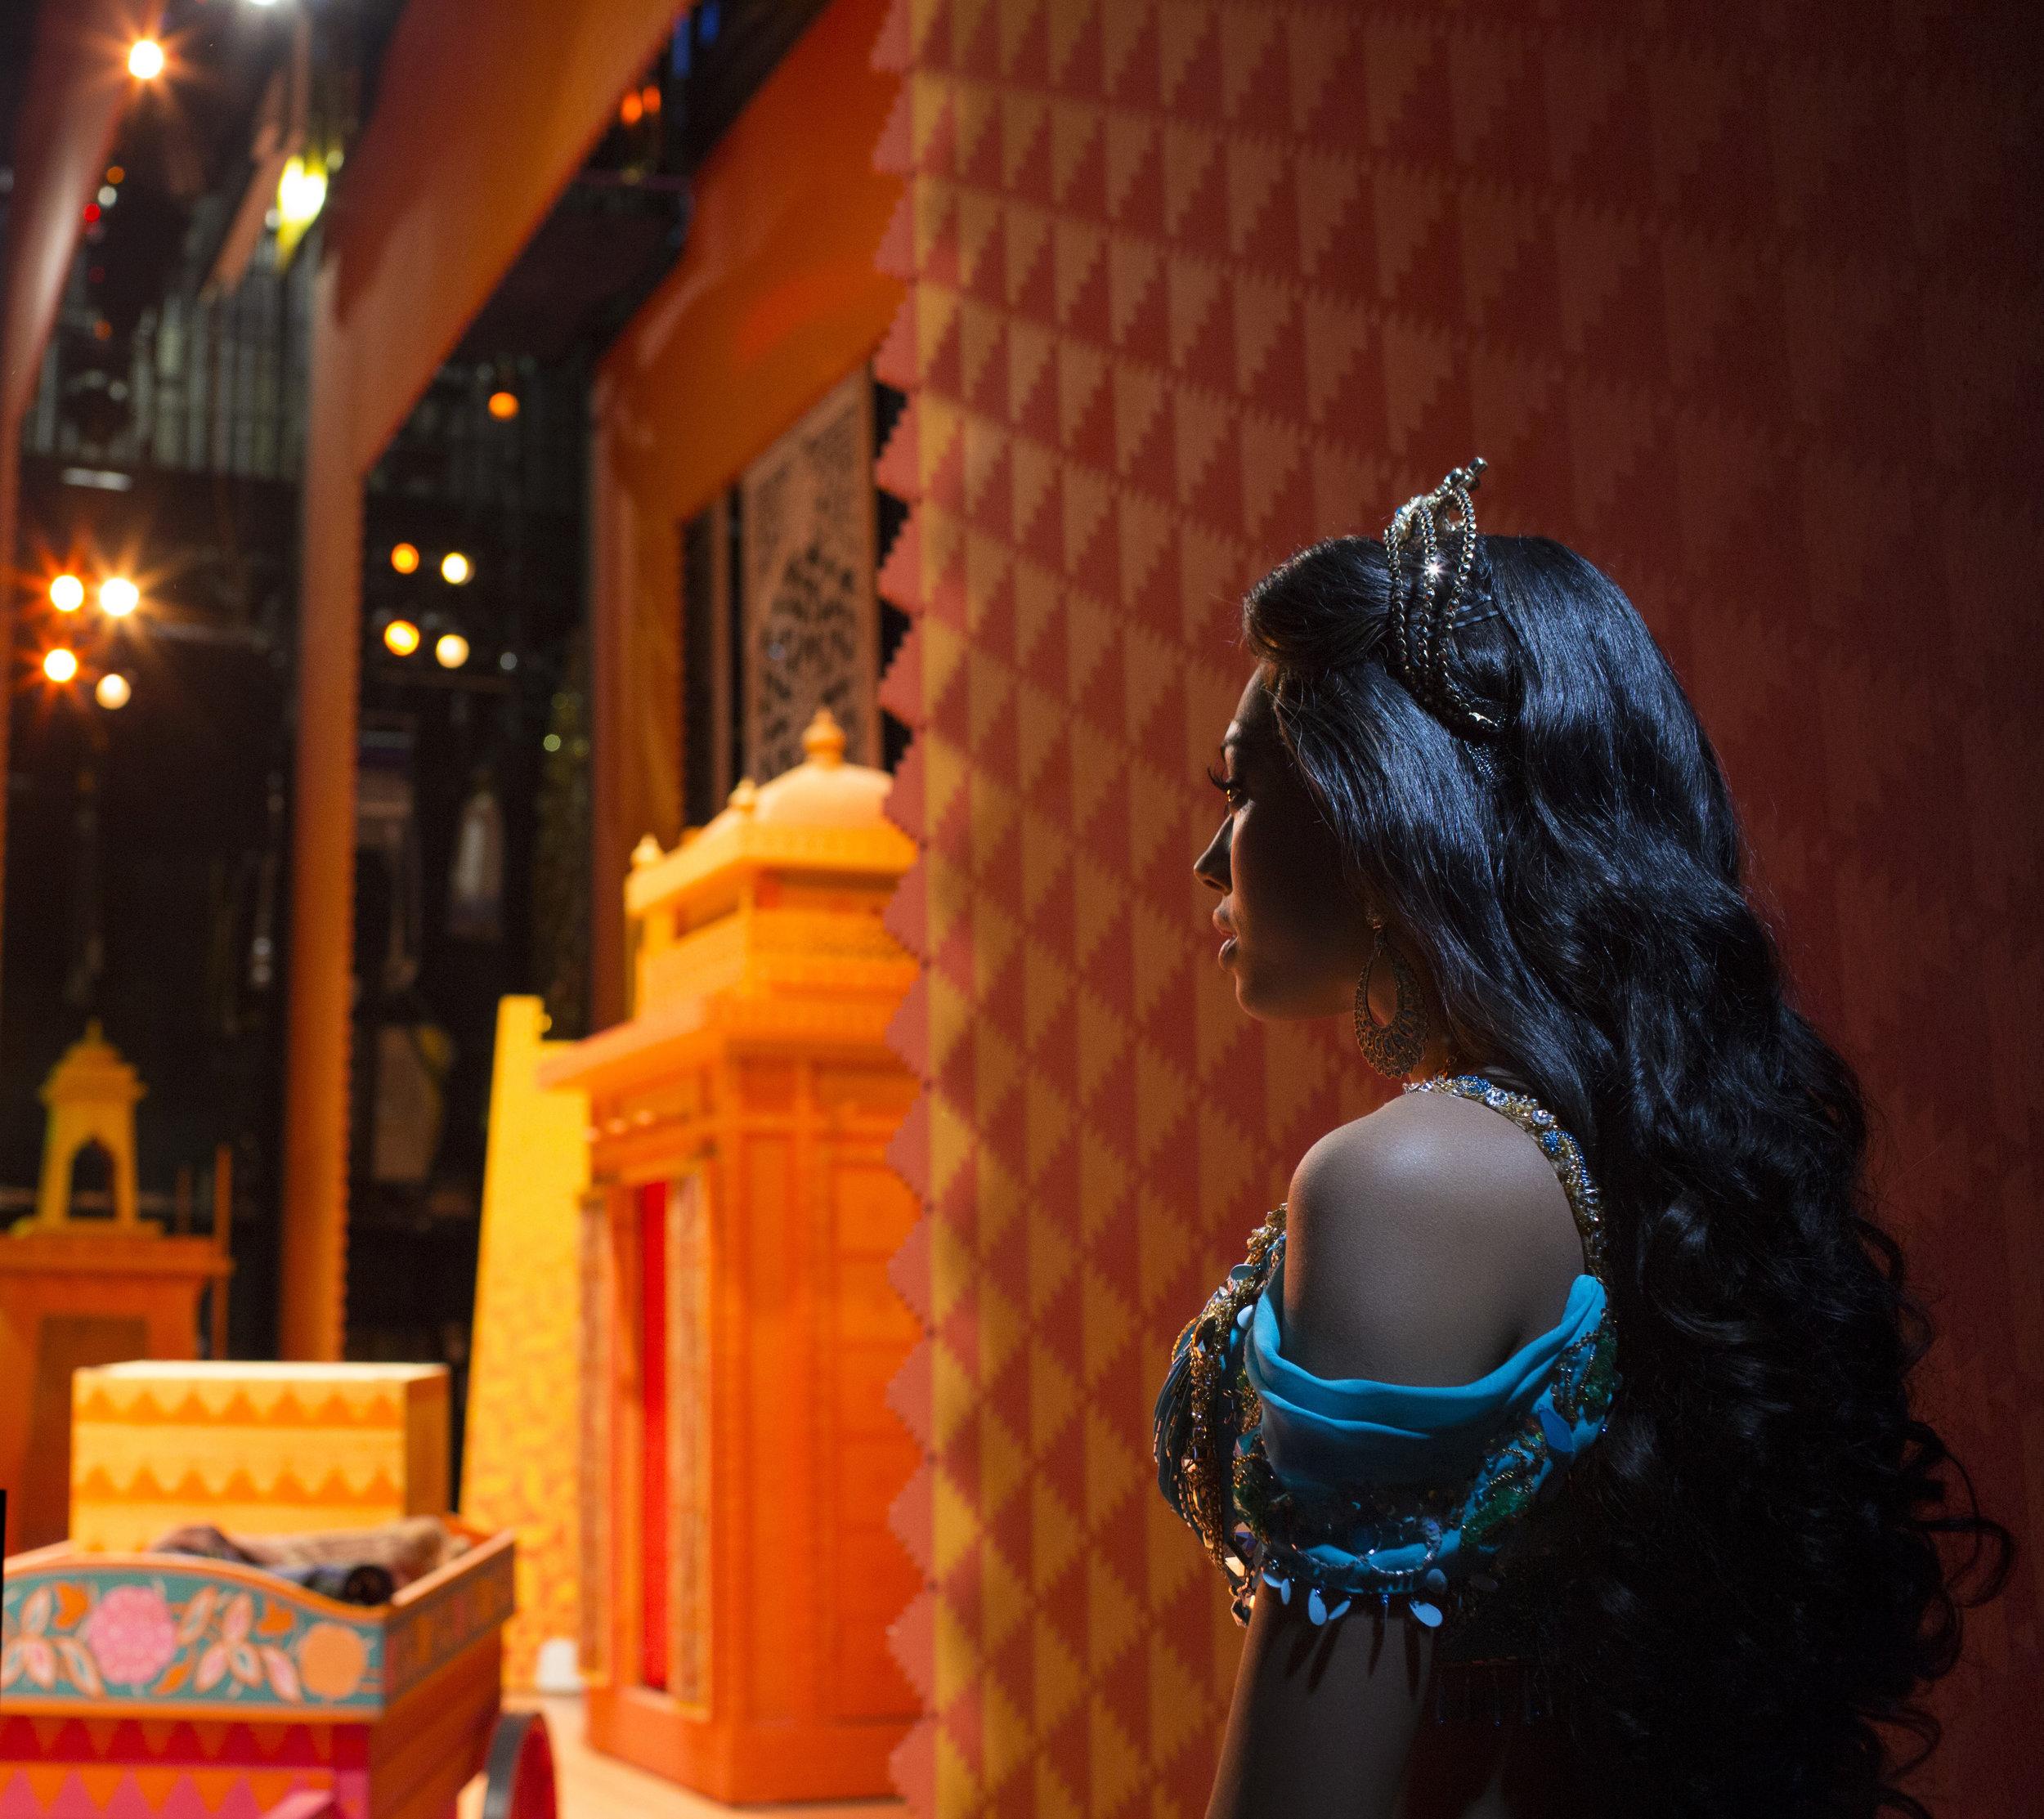 Aladdin_Backstage at Prince Edward Theatre_Jade Ewen (Jasmine)_Copyright Disney_092_1.jpg